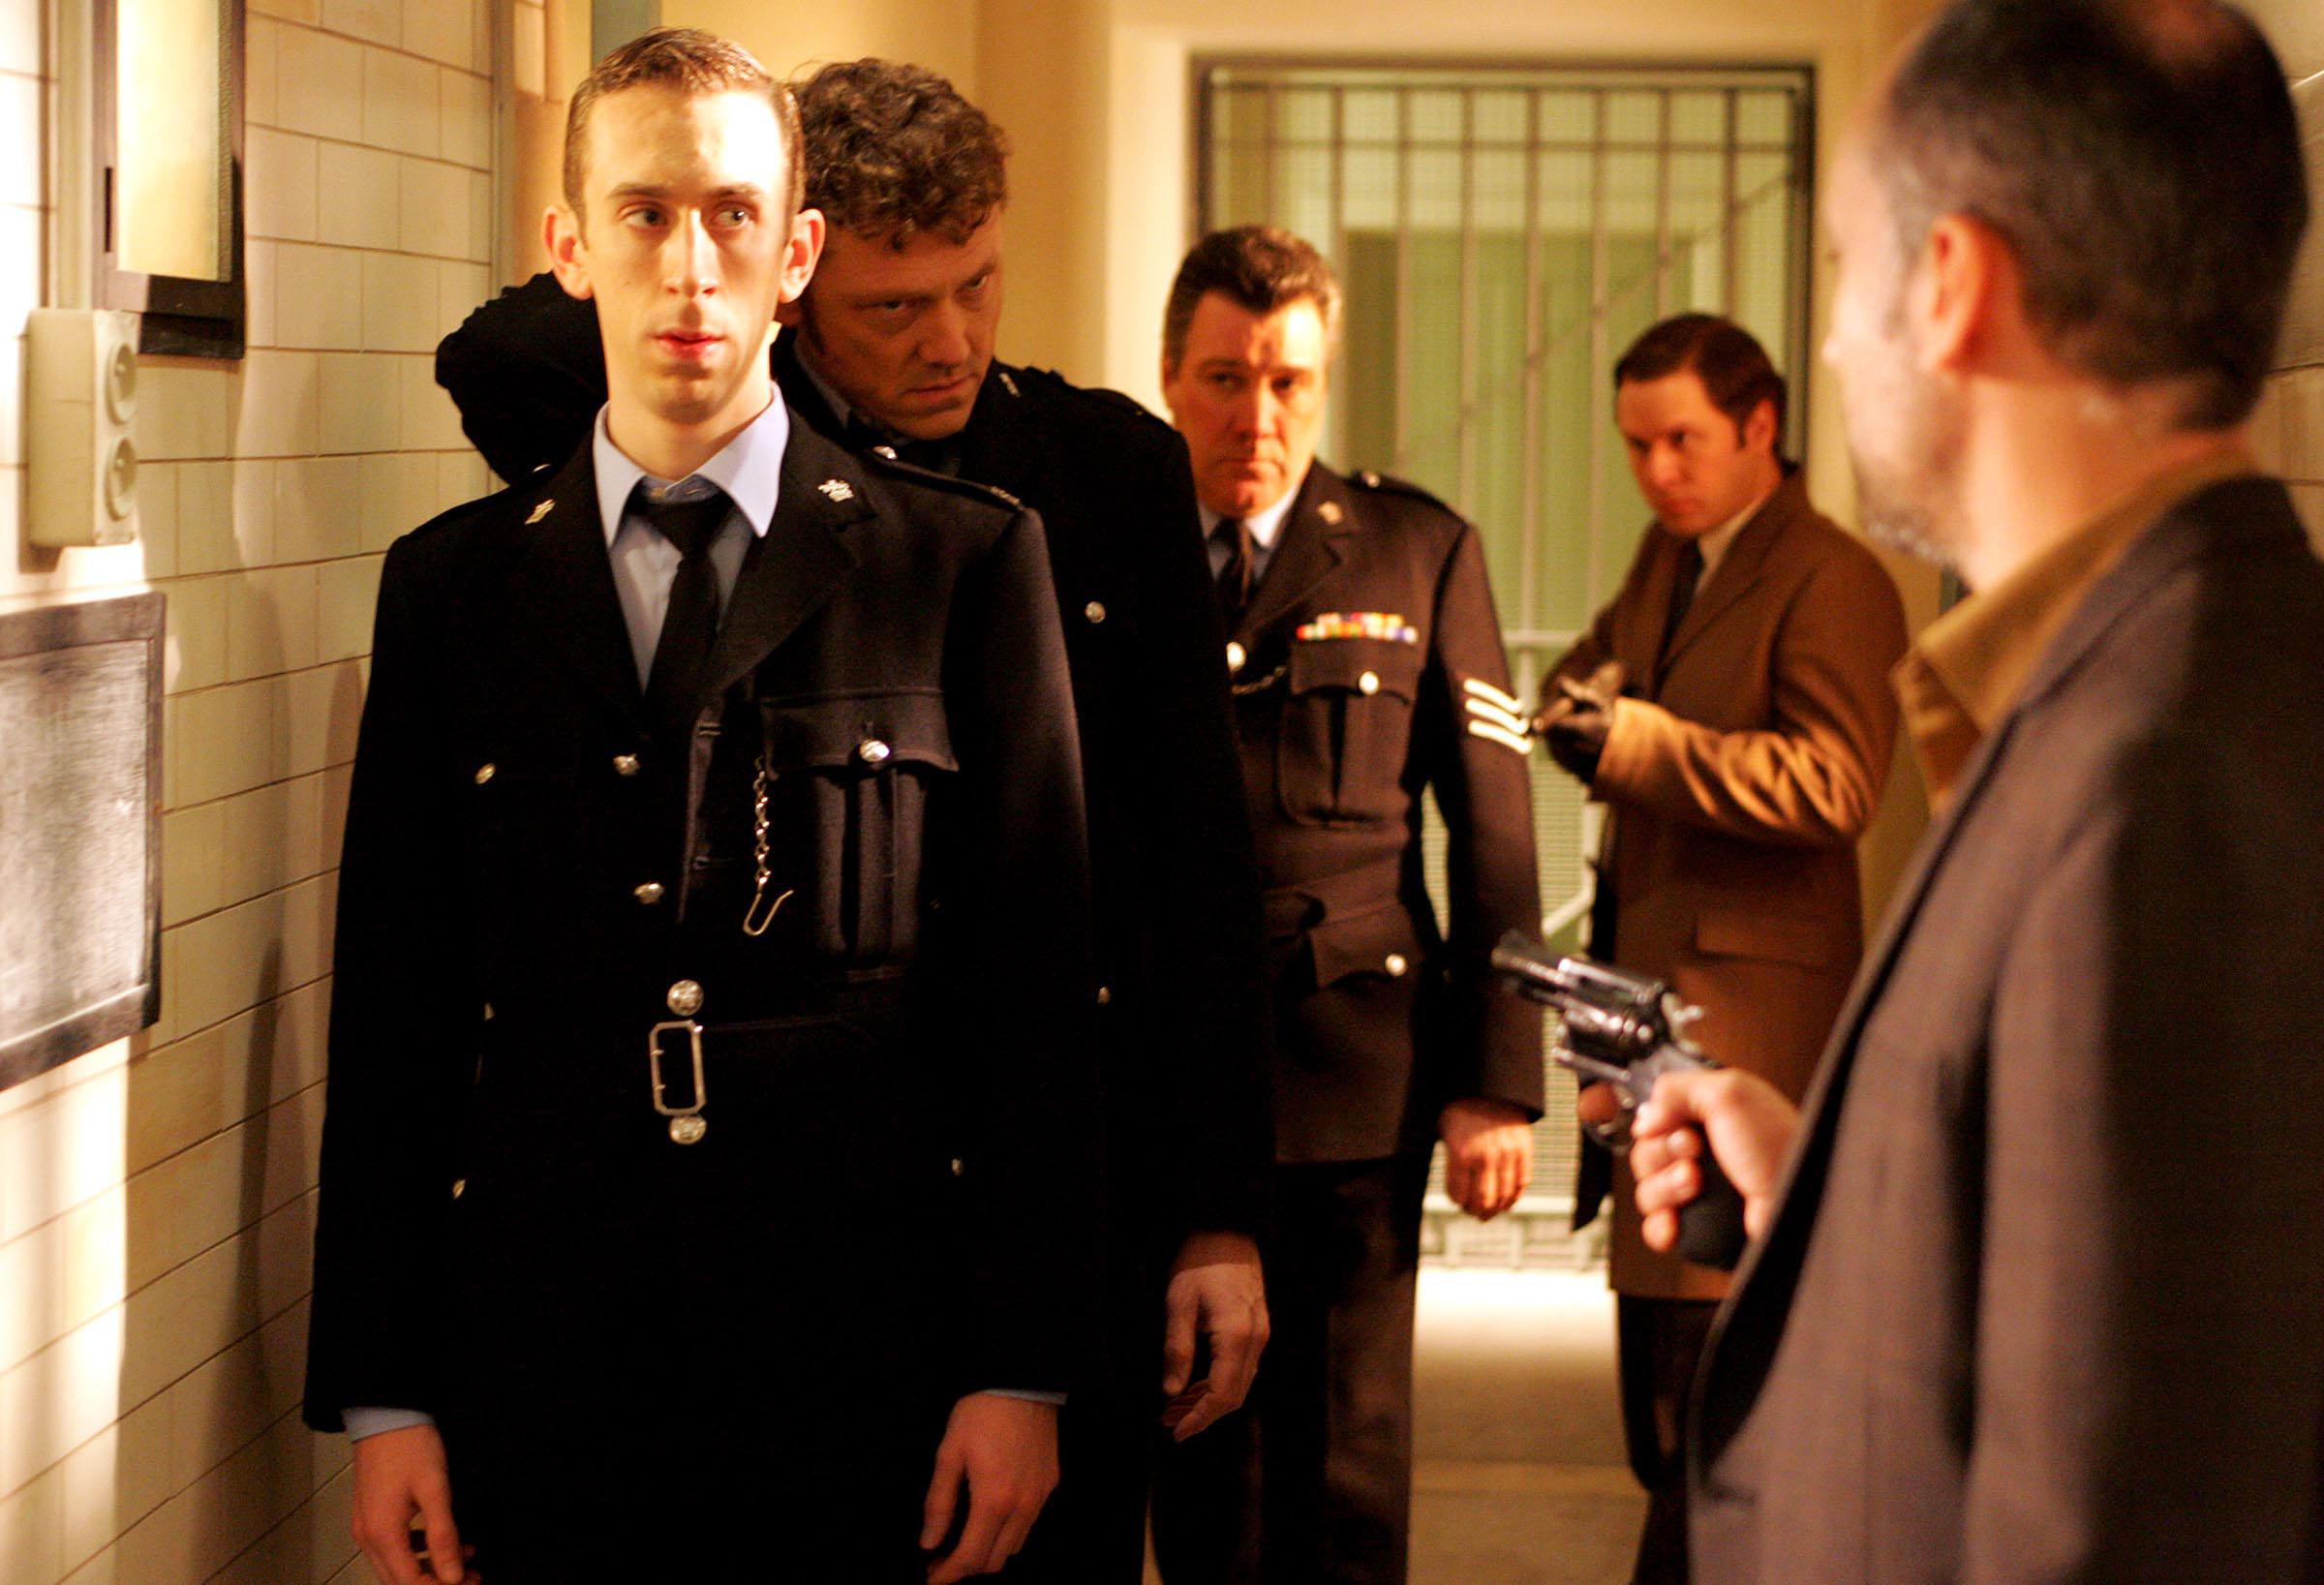 Ashfordly police under siege